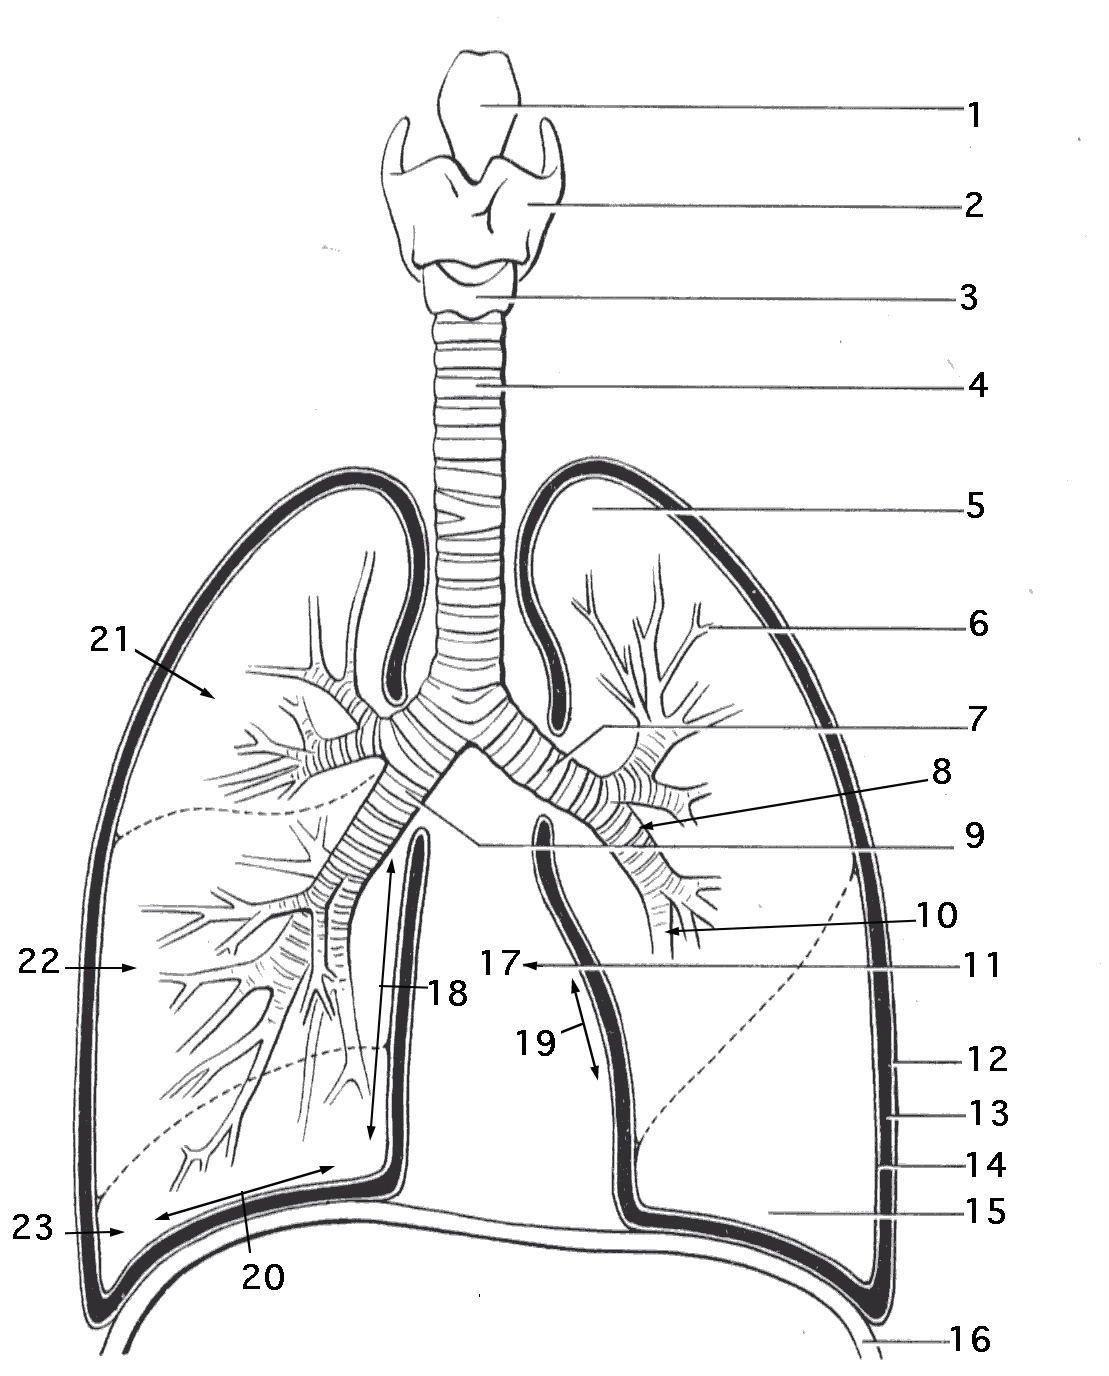 Respiratory System Labelling Worksheet Image Result For